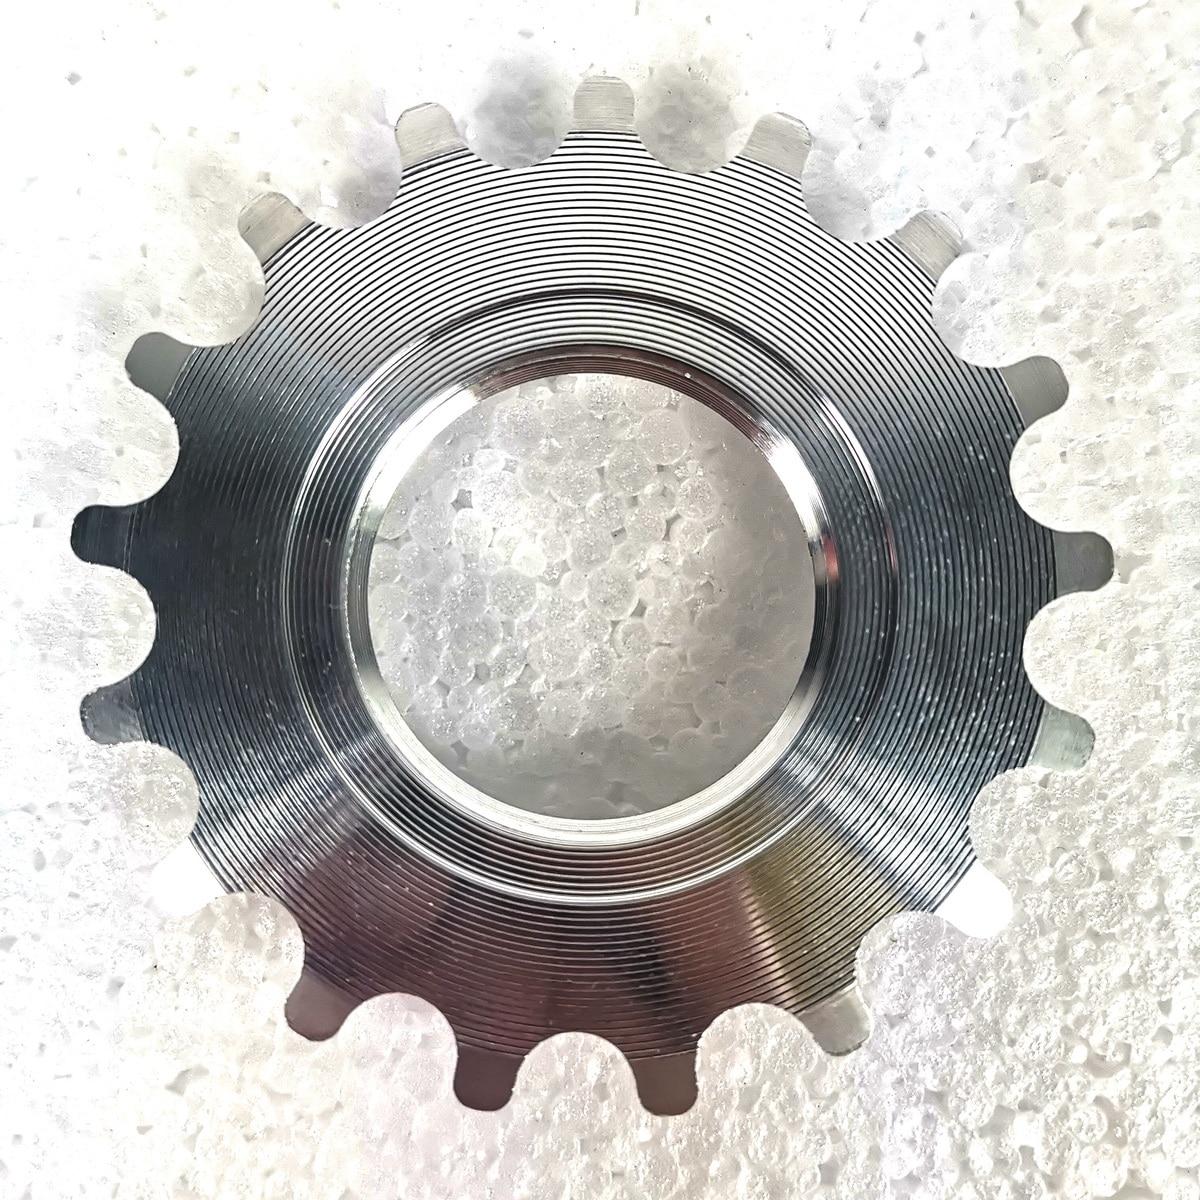 Light Timetec FIXED GEAR Cog Alloy 17T Bike Sprocket Freewheel Ring Bicycle Parts Single Speed